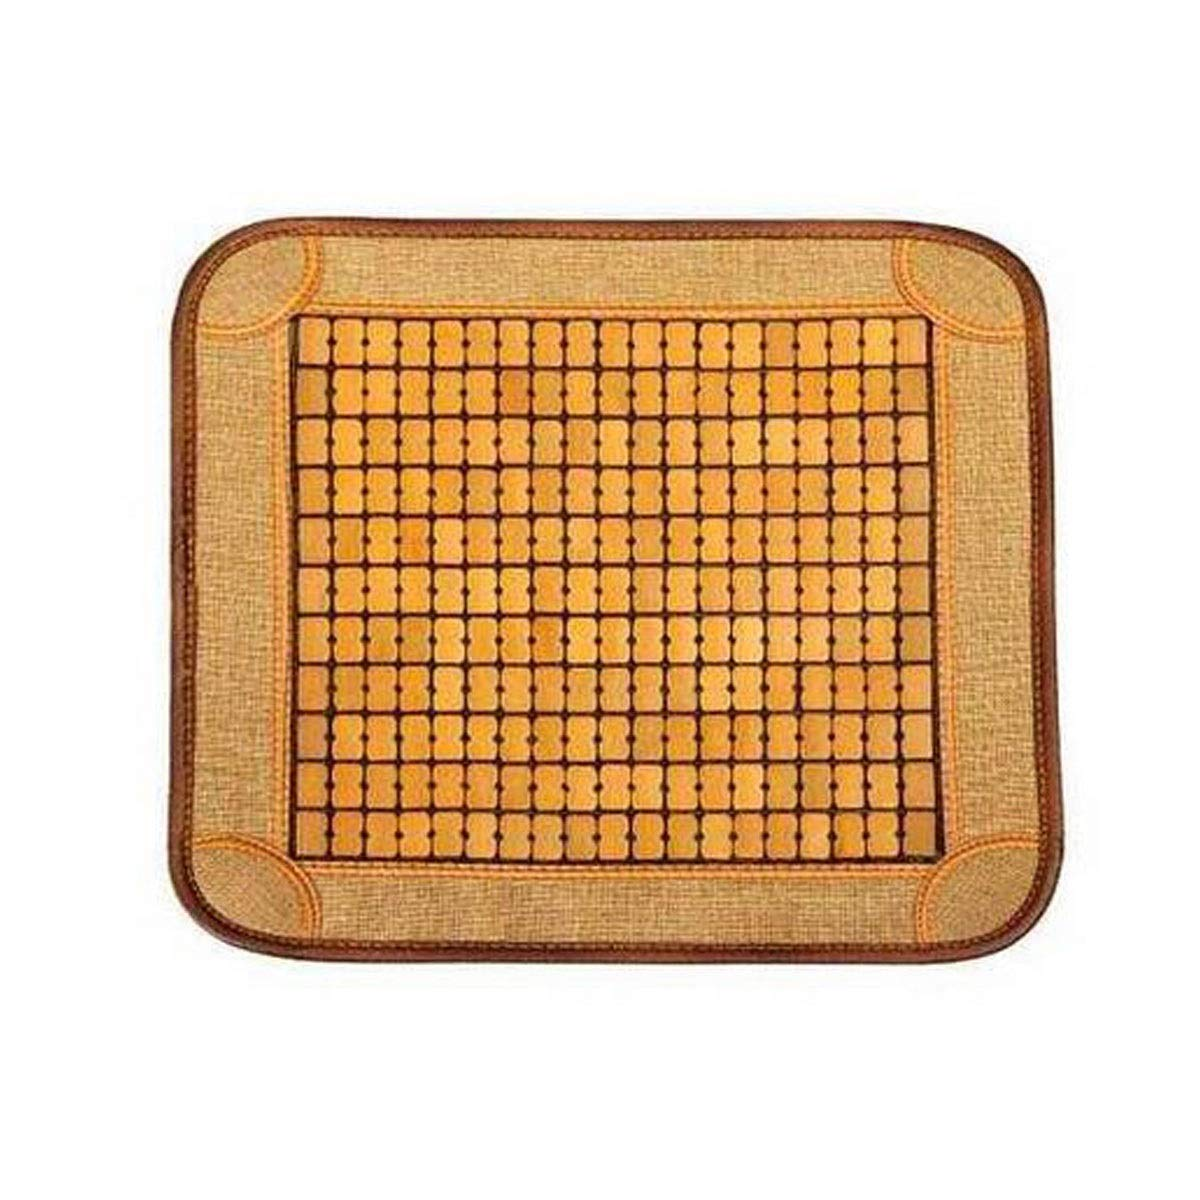 Jielongtongxun 木製マット、竹マットクッション、カーソファオフィス学生チェアクッション竹マット、ベージュマルチオプション (Color : Beige, Size : 40*40cm) B07RL9LPJ7 Beige 40*40cm